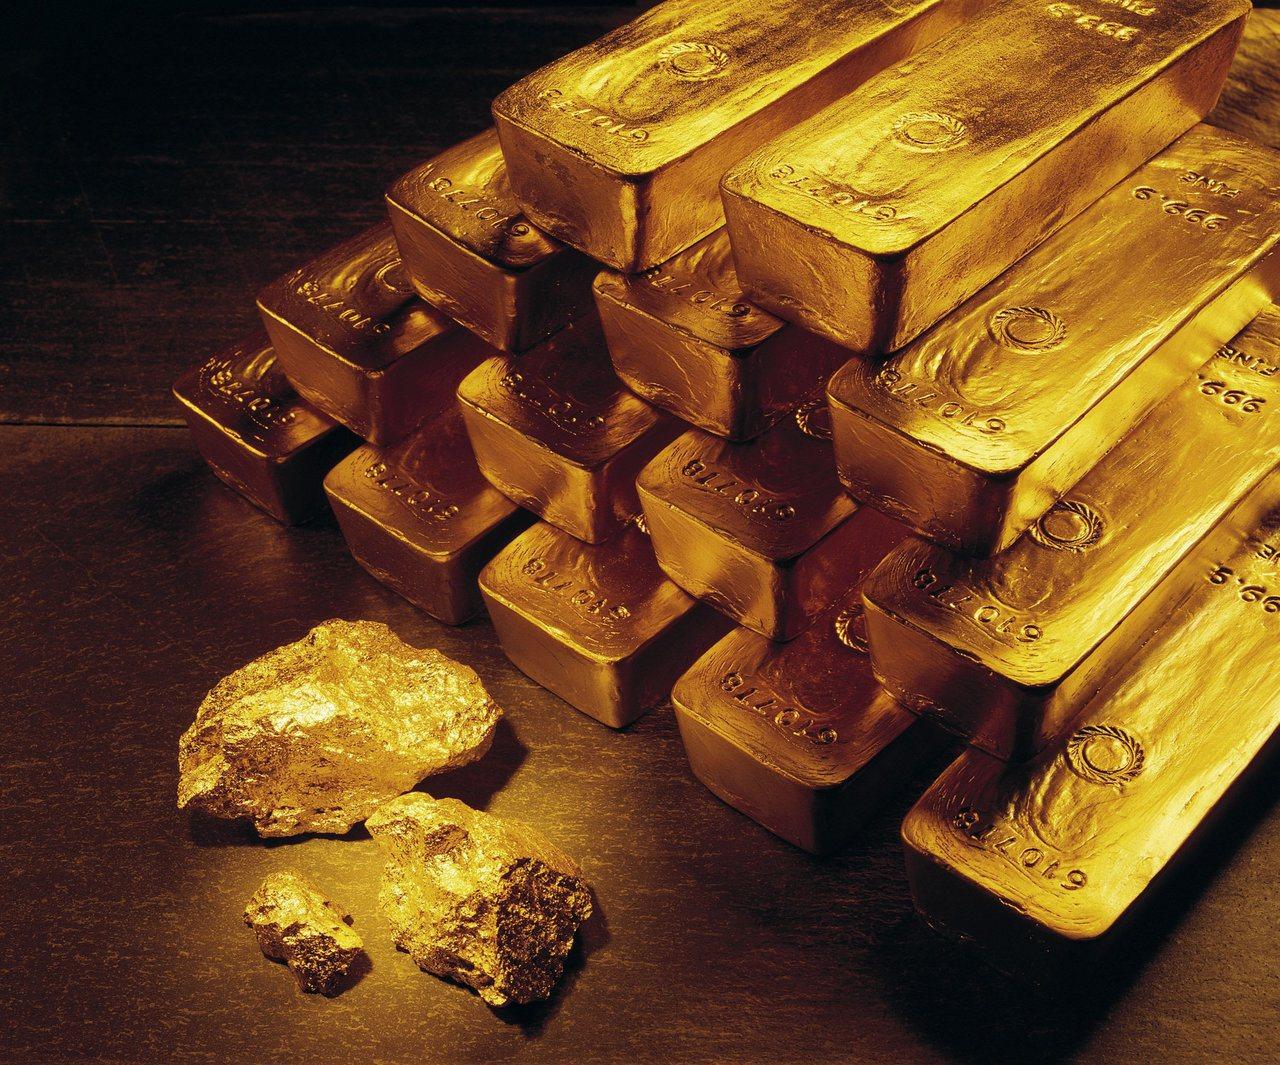 Newmont礦業公司以100億美元價碼買下對手公司Goldcorp,成為全球最...